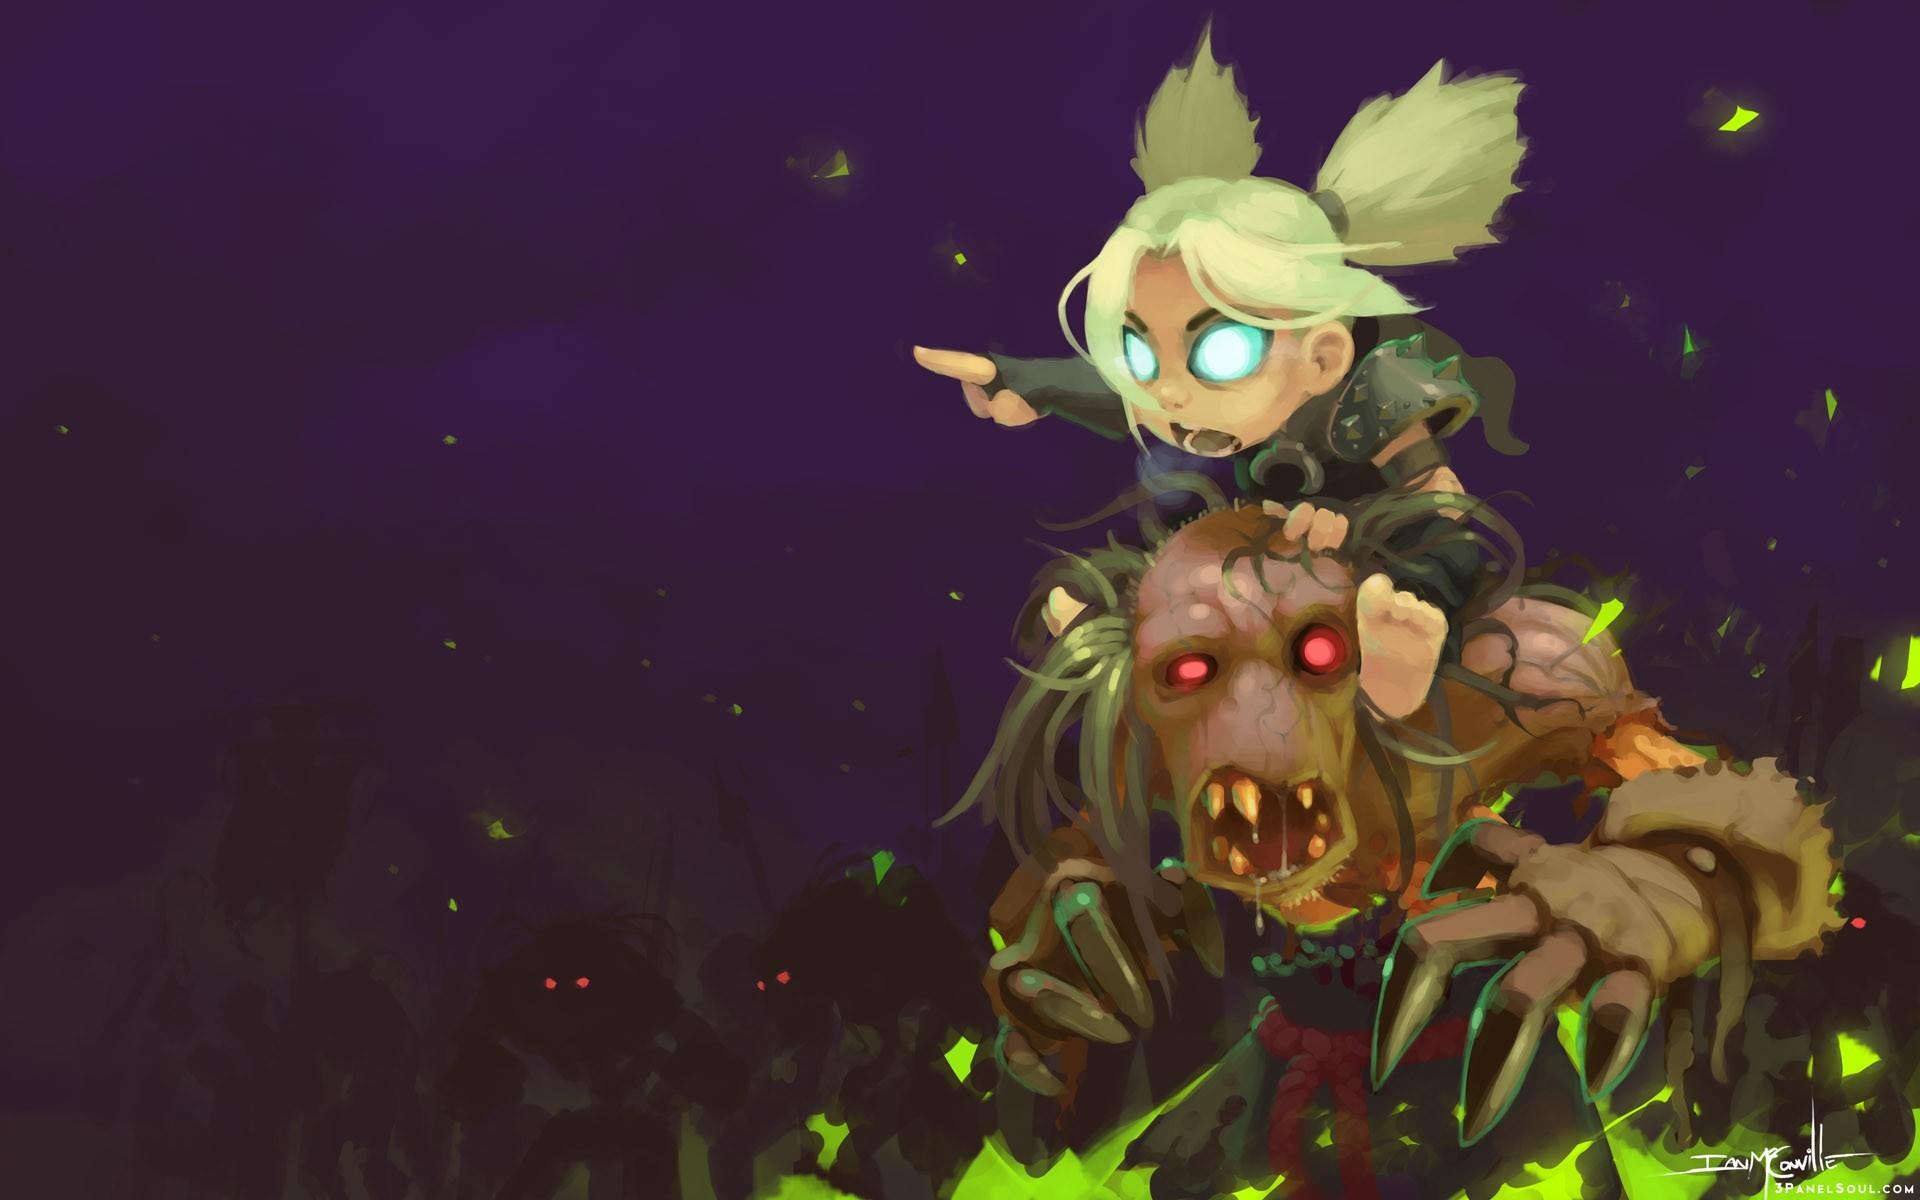 Wallpaper Illustration Anime World Of Warcraft Zombies